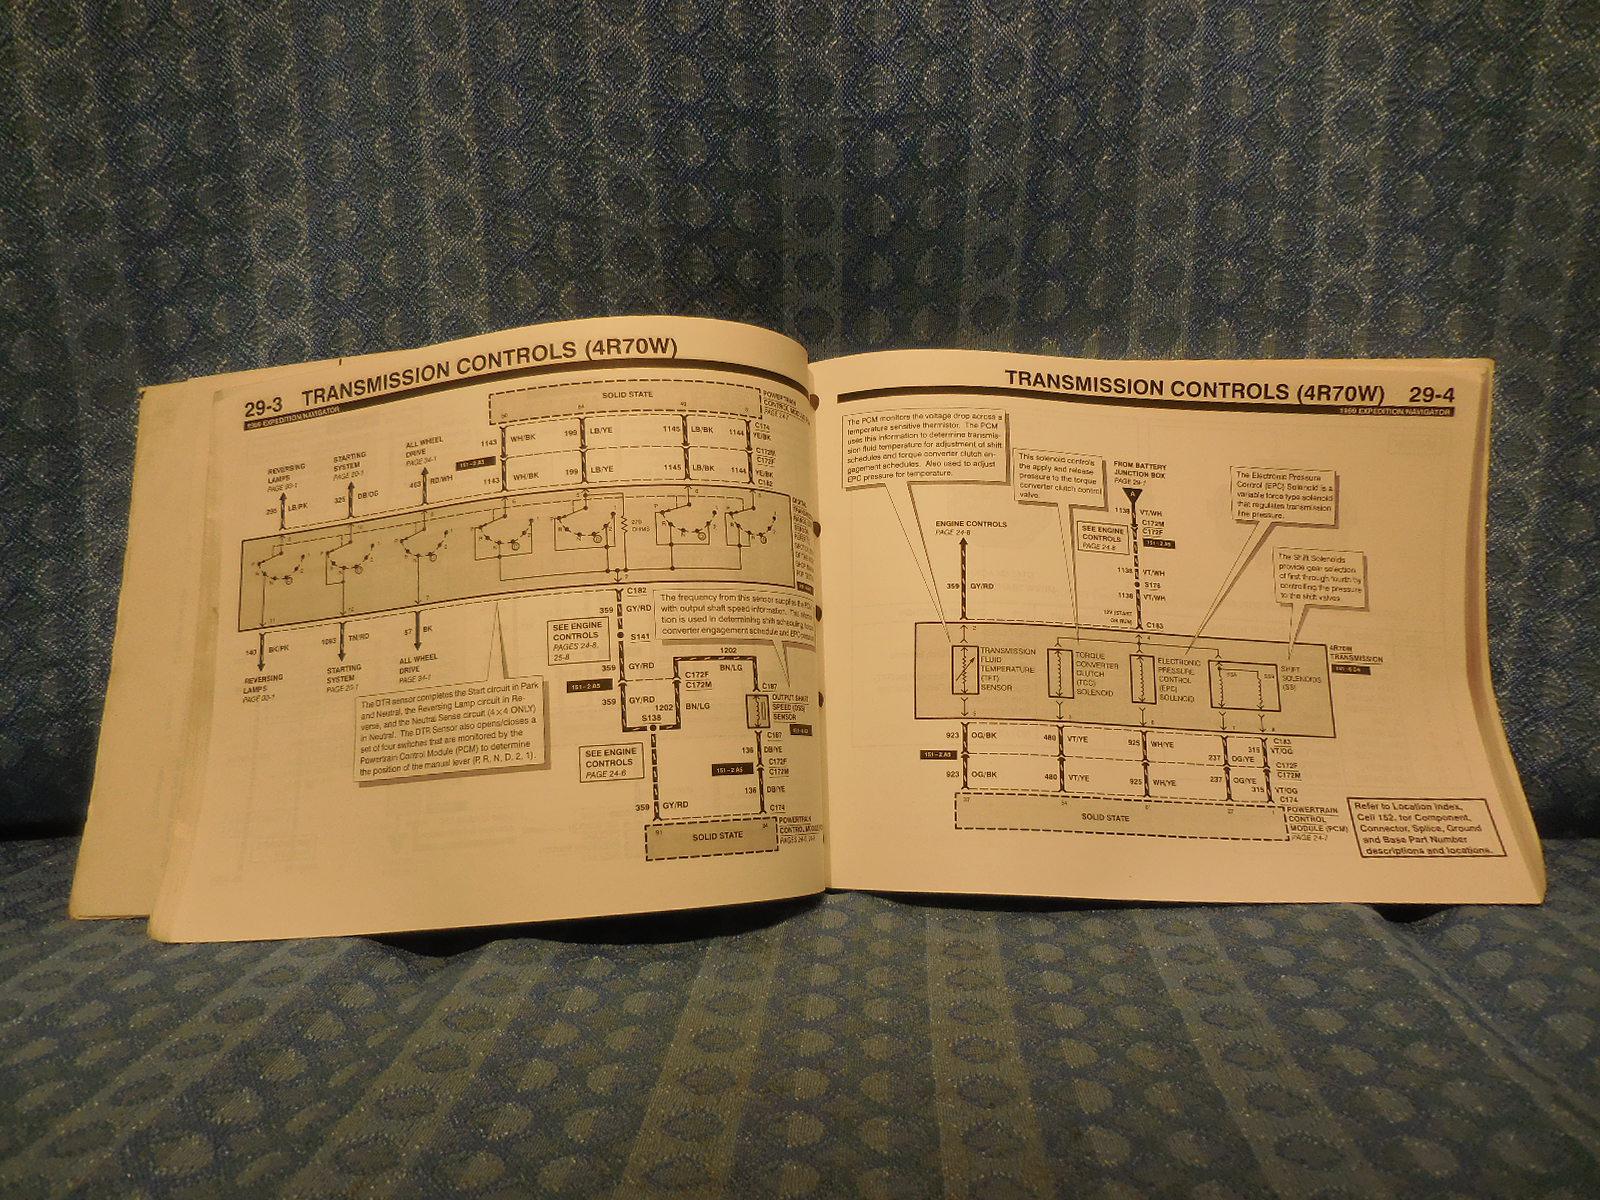 1999 Ford Expedition Lincoln Navigator Original Oem Shop Wiring Diagrams Manual Nos Texas Parts Llc Antique Auto Parts